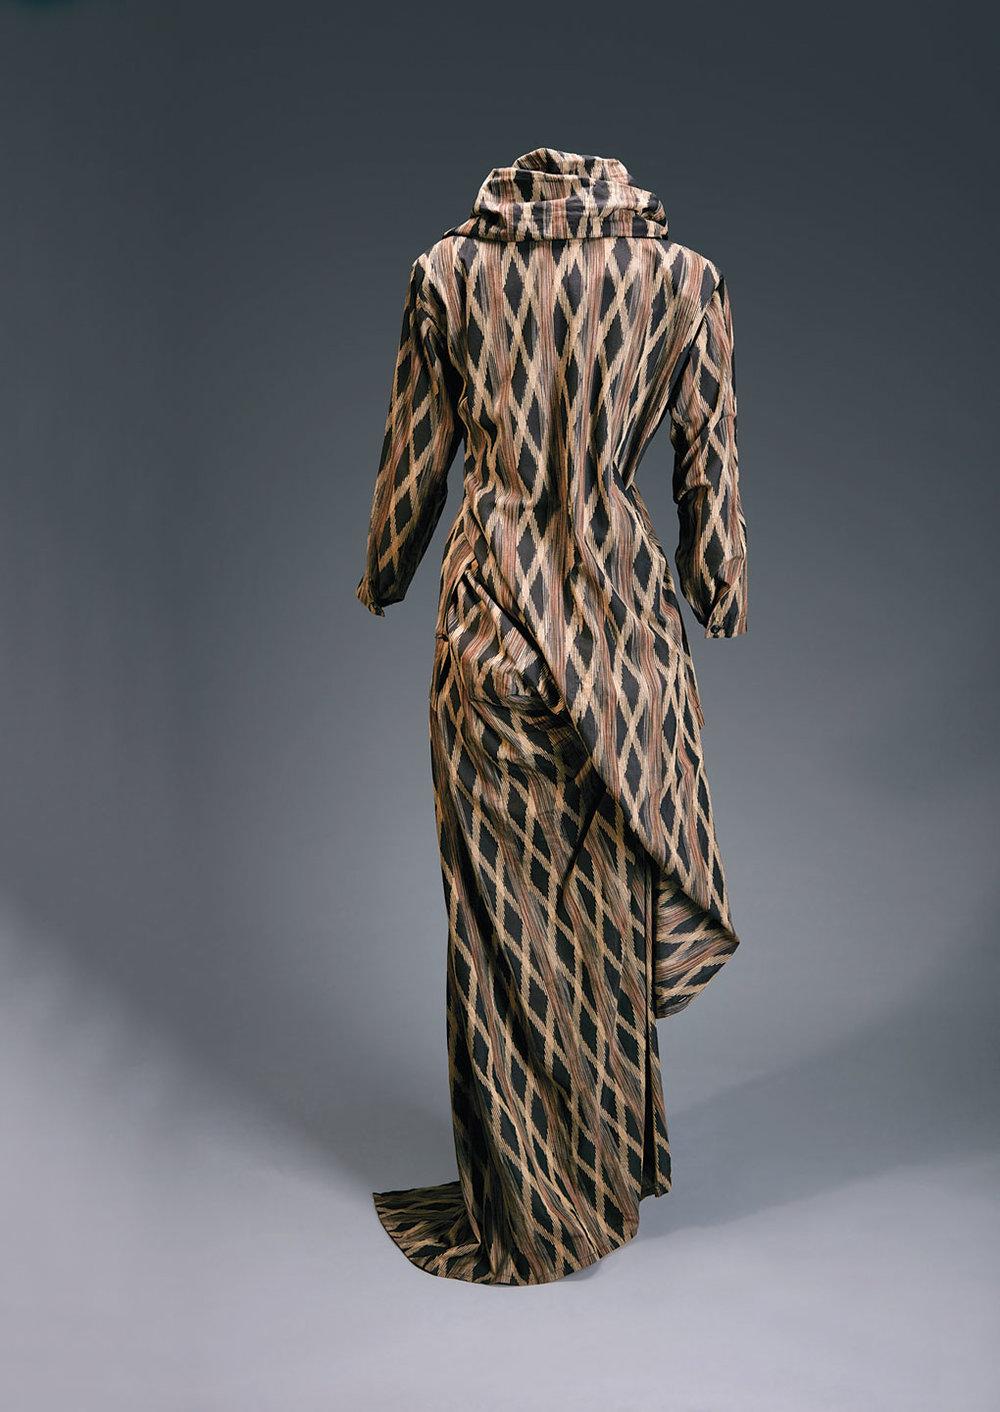 Shockwave-Issey-Miyake_Jacket-w-Transformable-Bustle-and-Asymmetric-Skirt.jpg